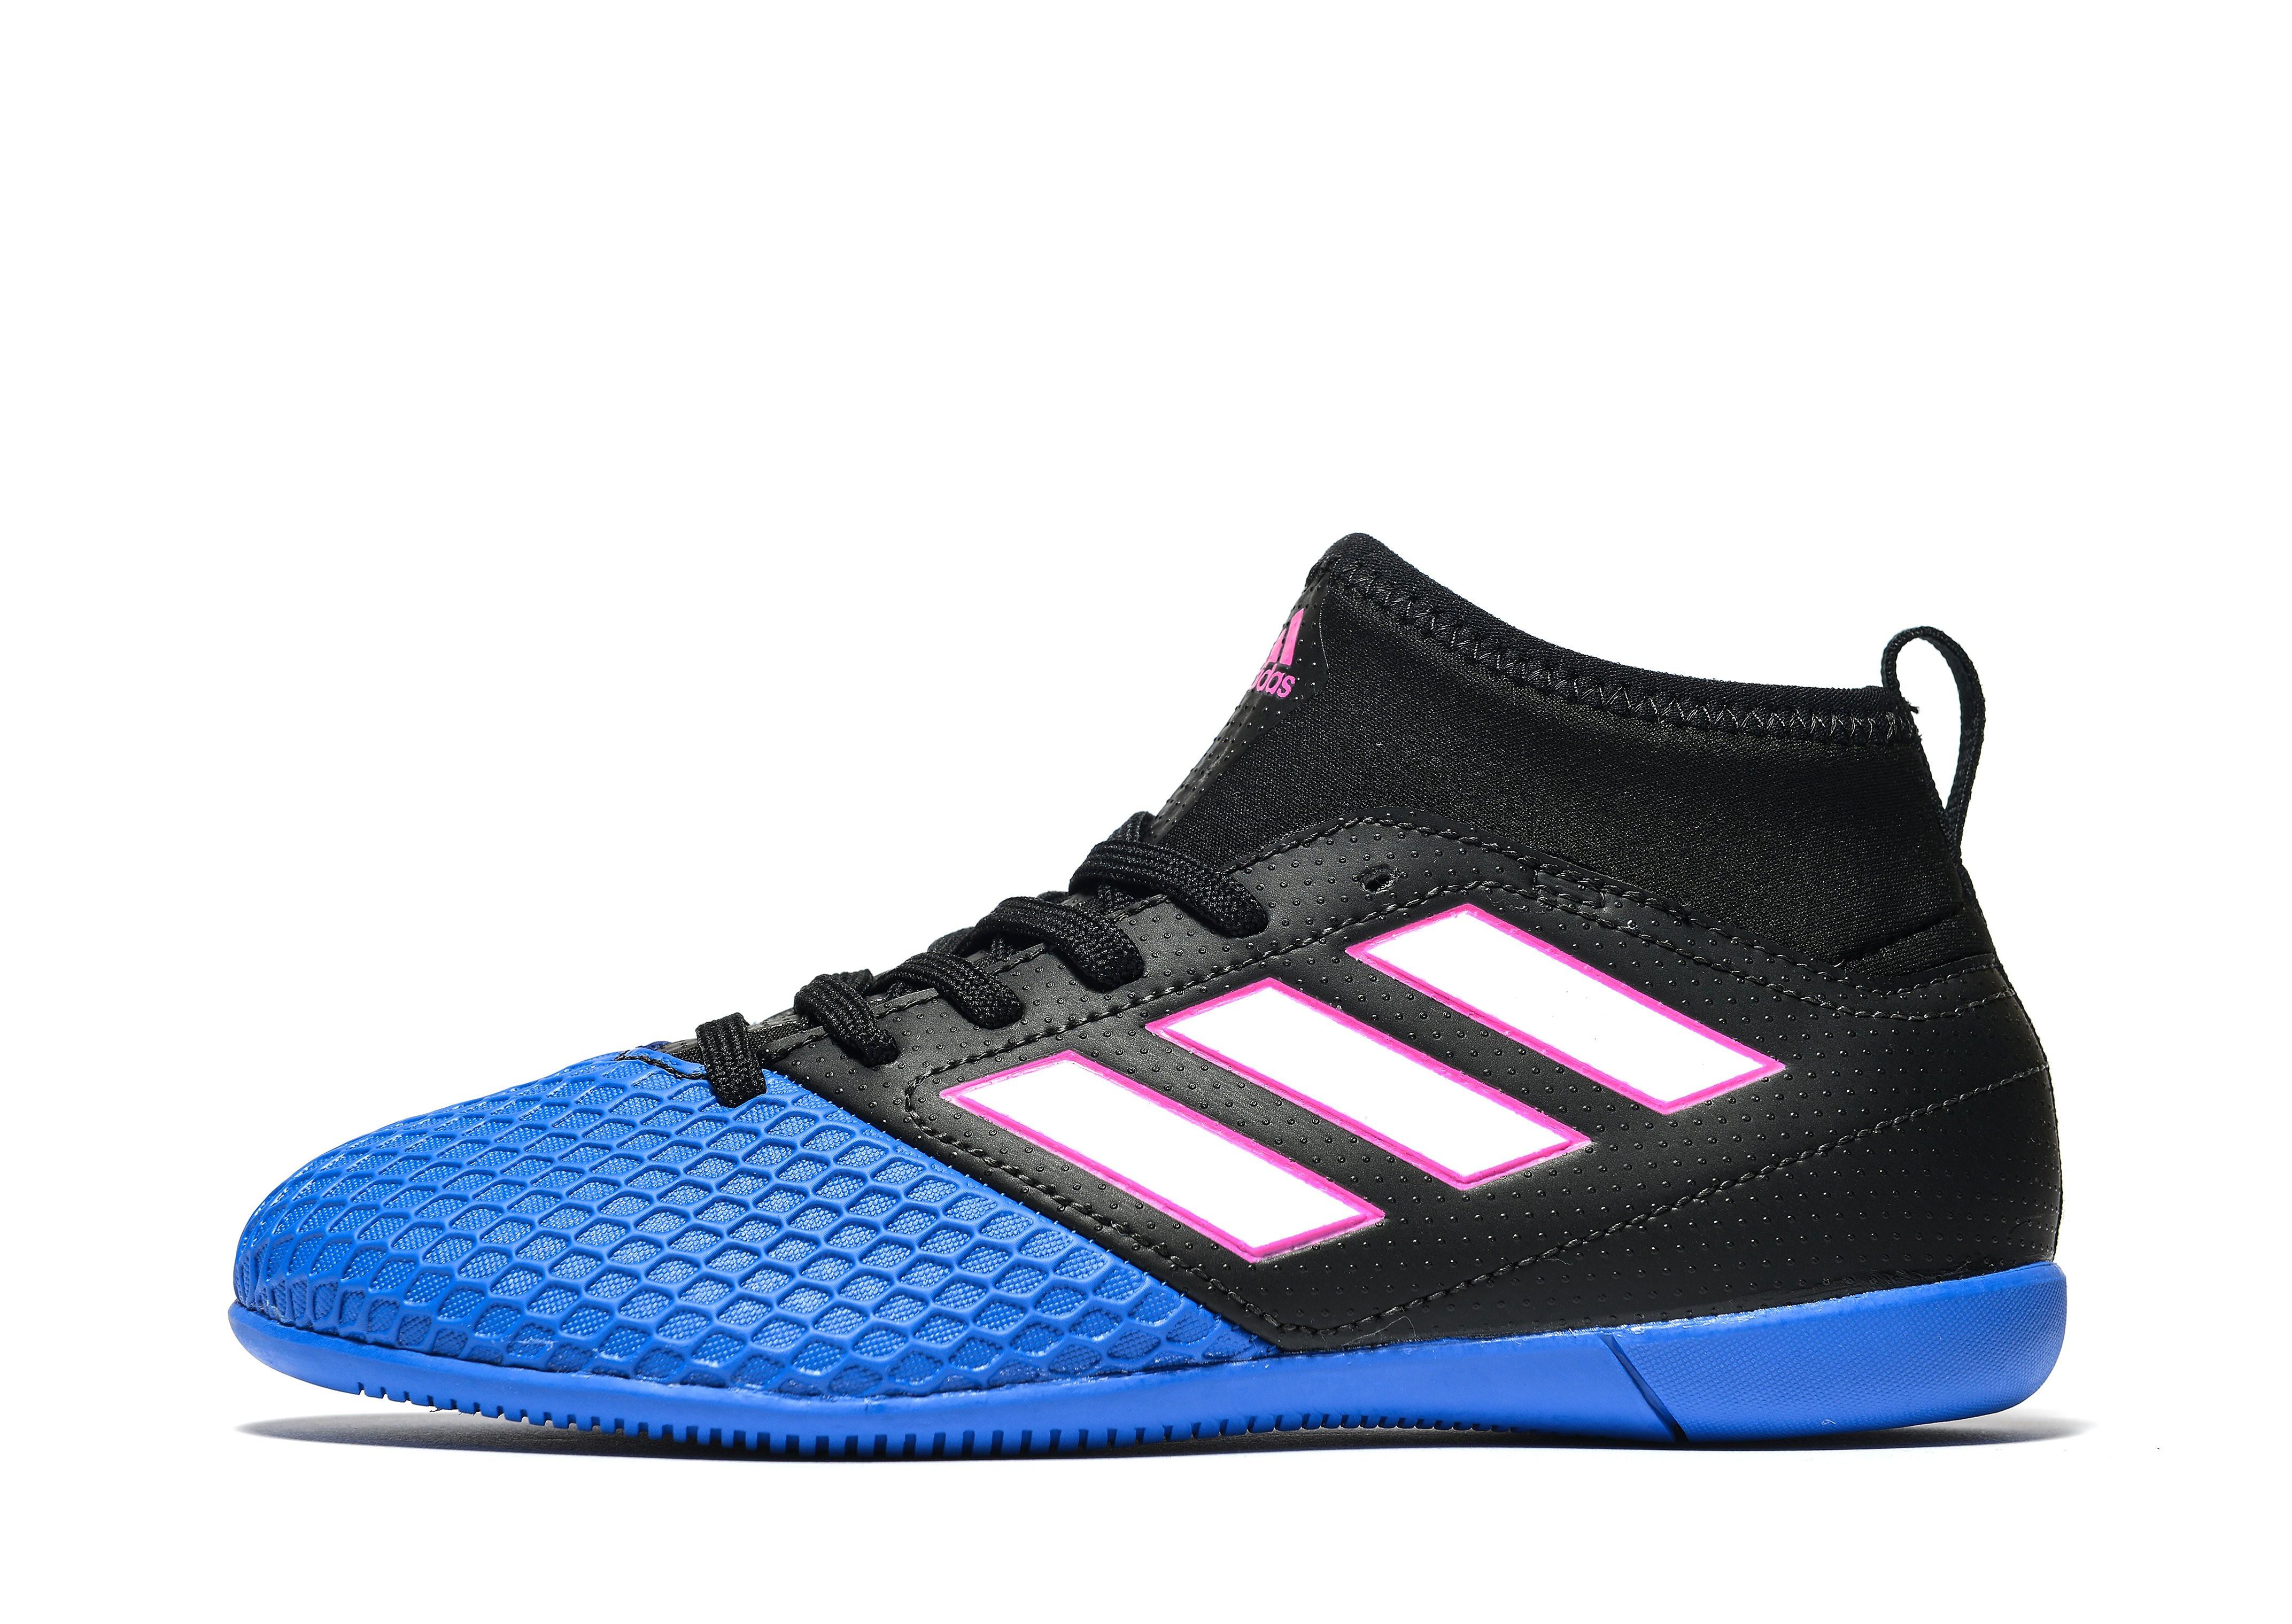 Image de adidas Blue Blast Ace Primemesh 17.3 IC Enfant - Black